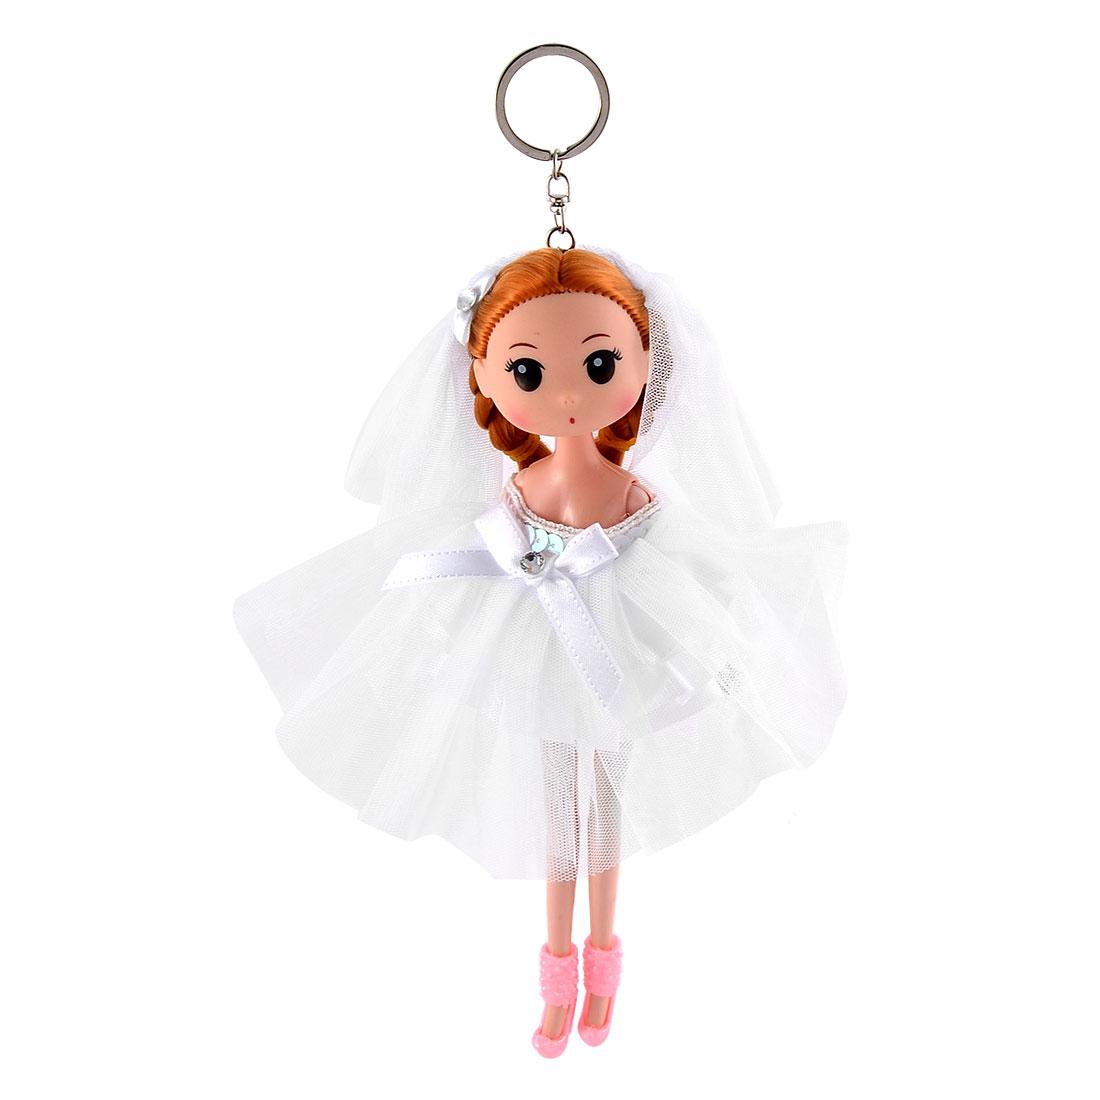 Women Handbag Innocent Girl Ornament Pendant Charm Doll Keychain Key Ring White